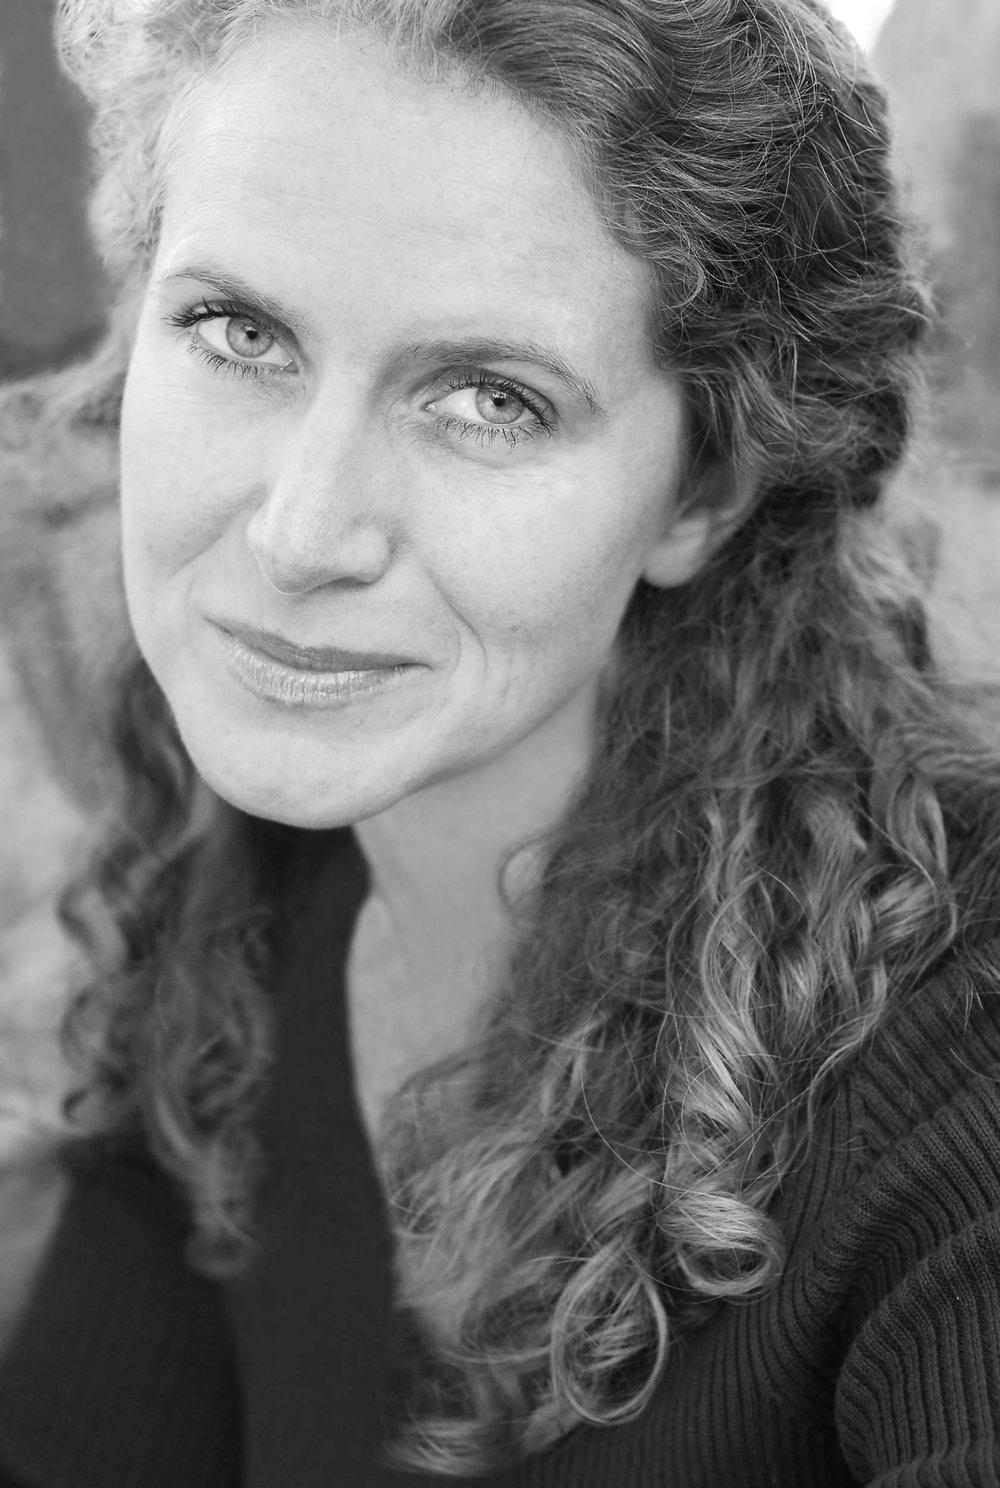 Laura Sturm